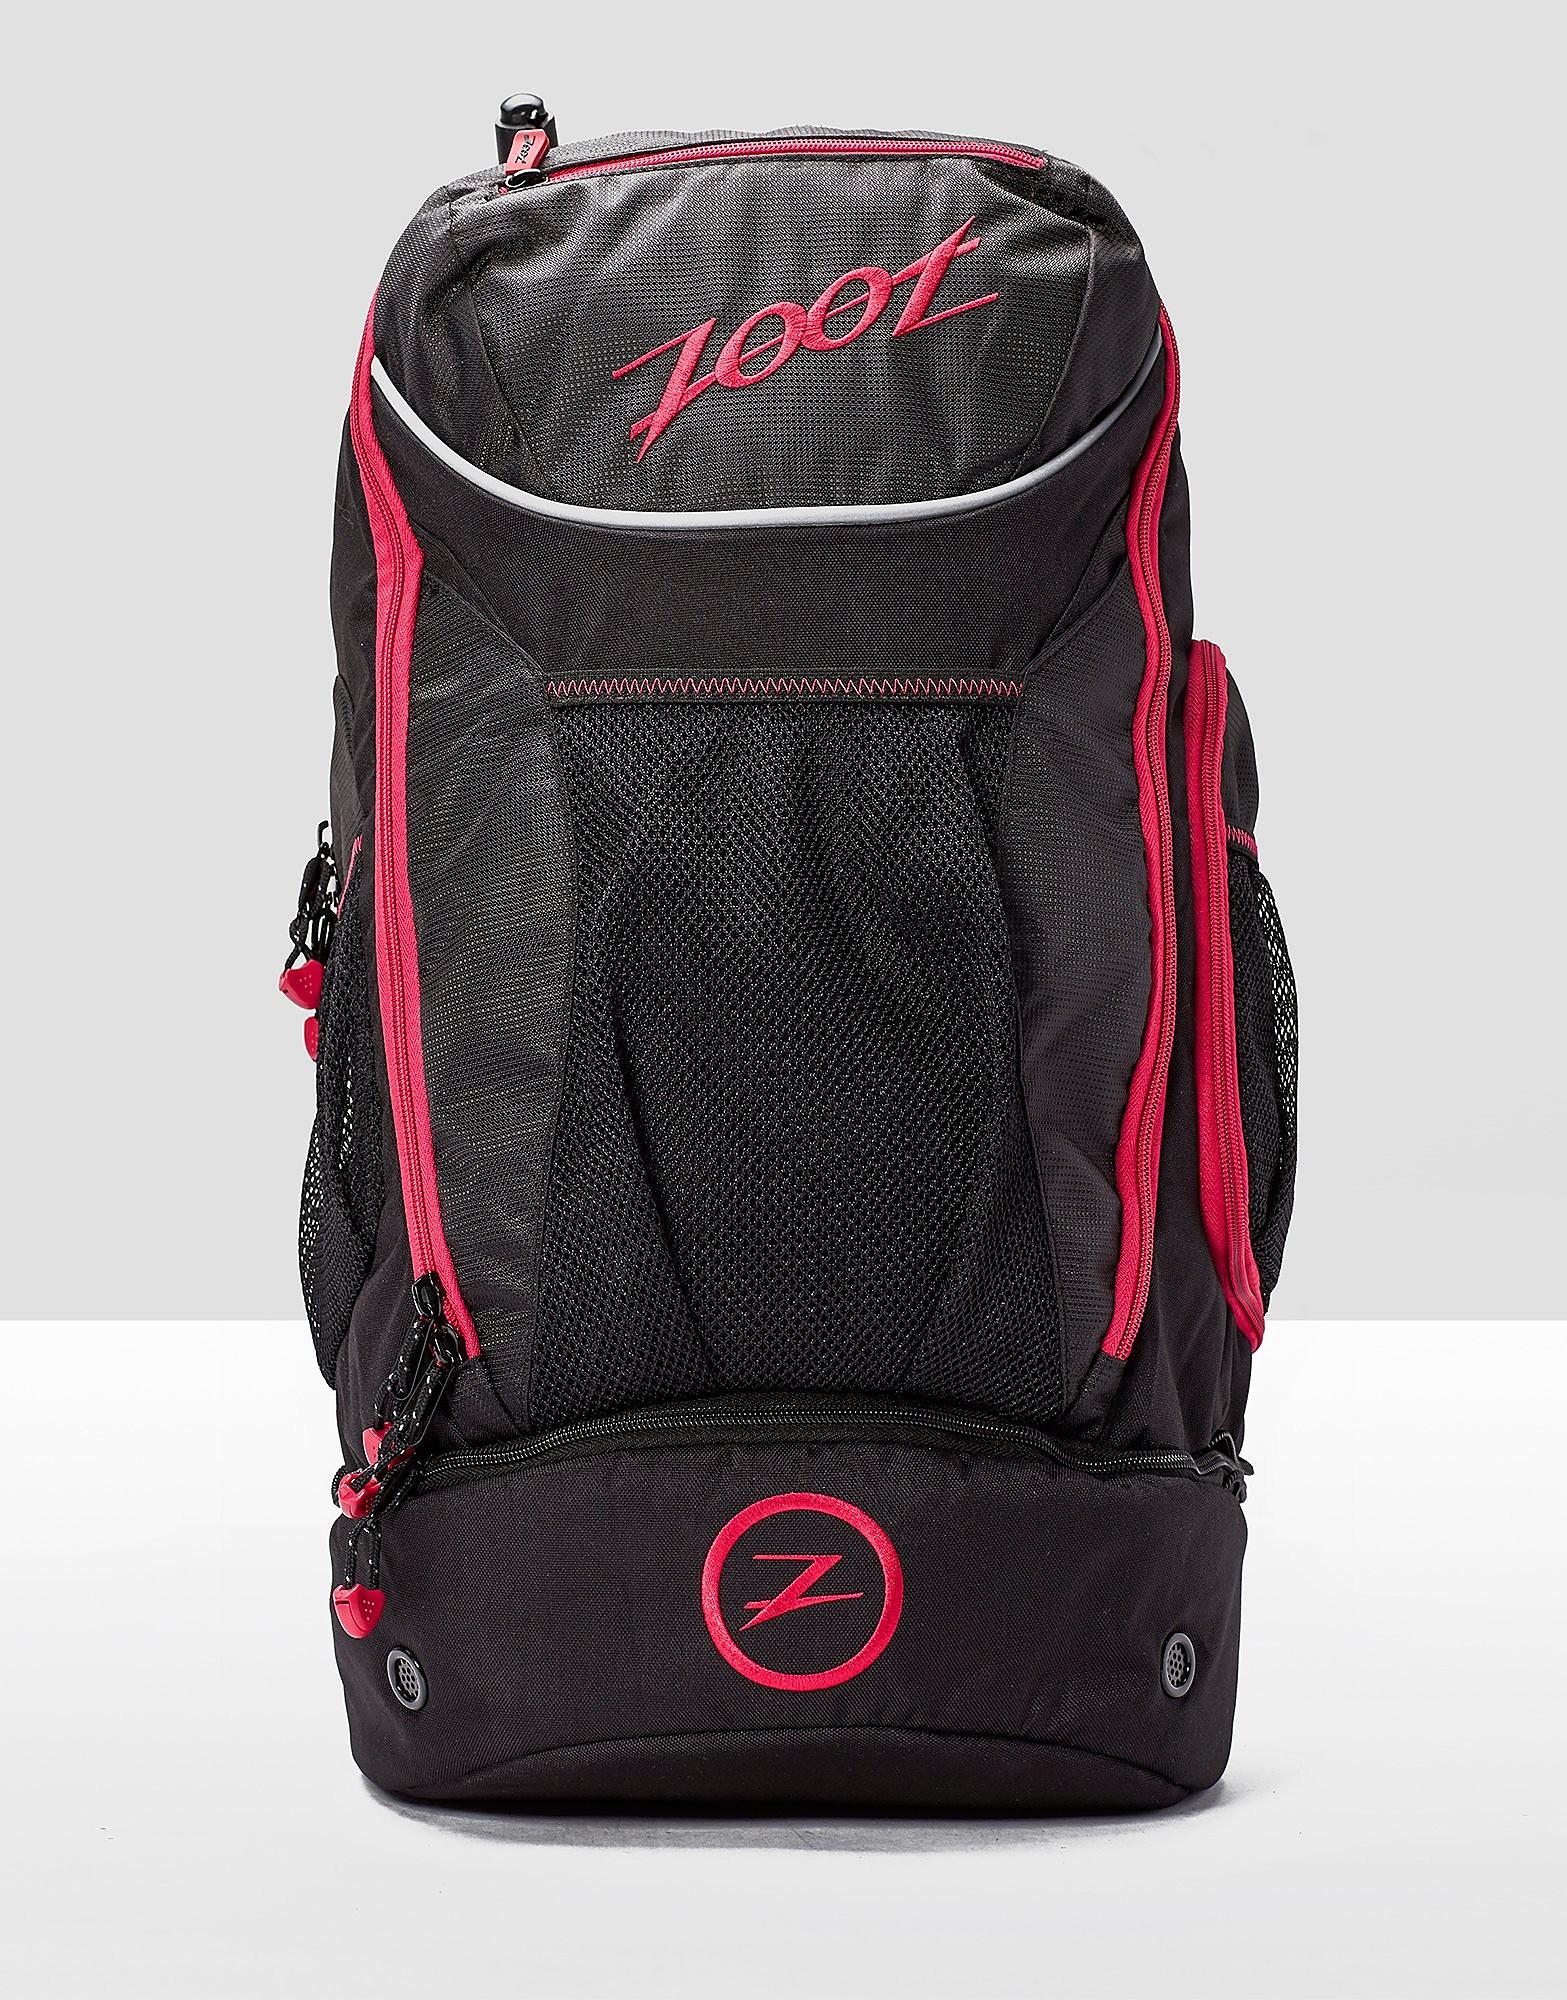 Zoot Transition 2.0 Triathlon bag